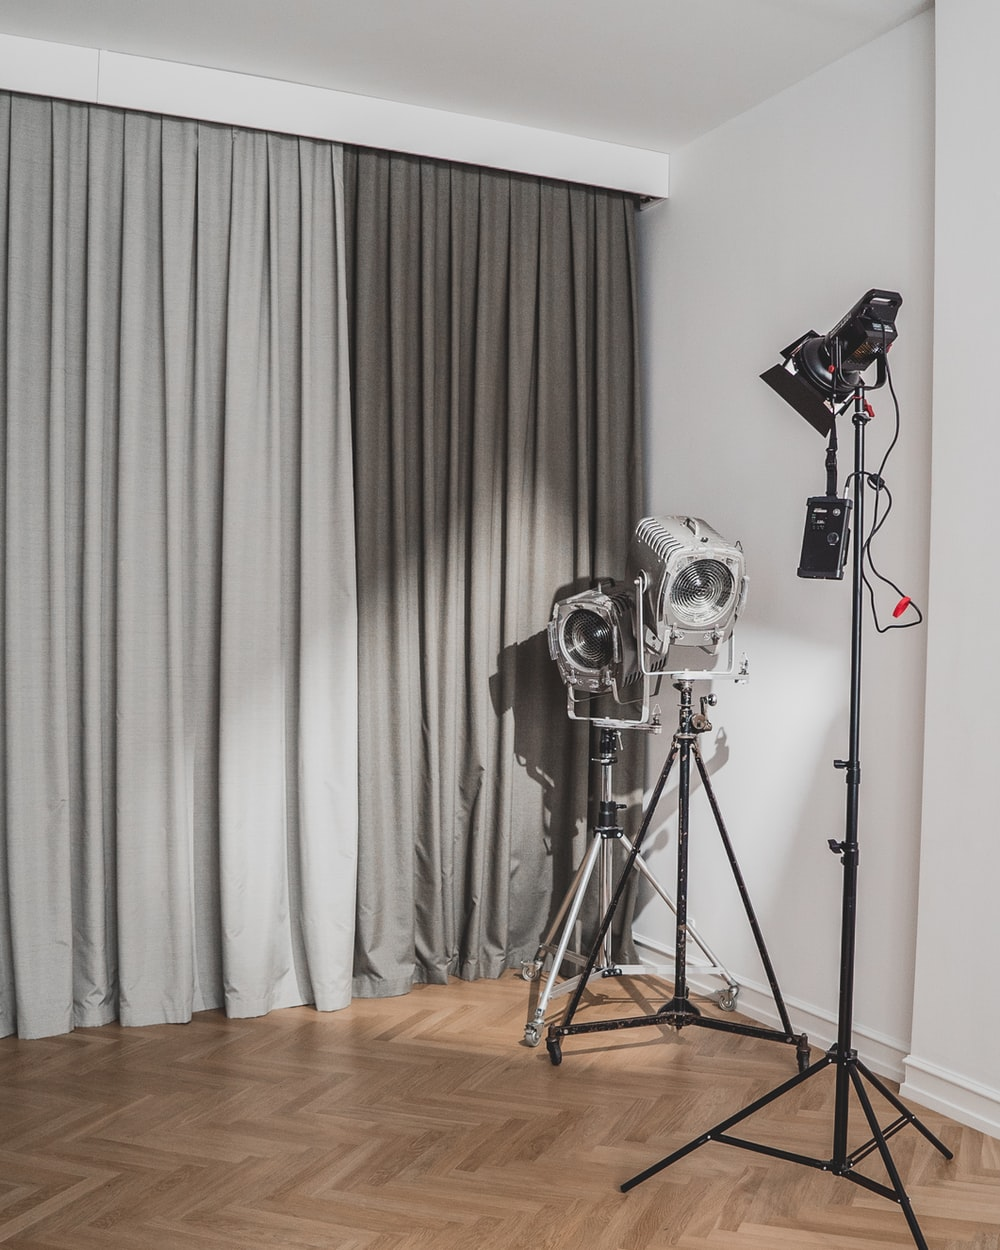 black and silver camera on tripod